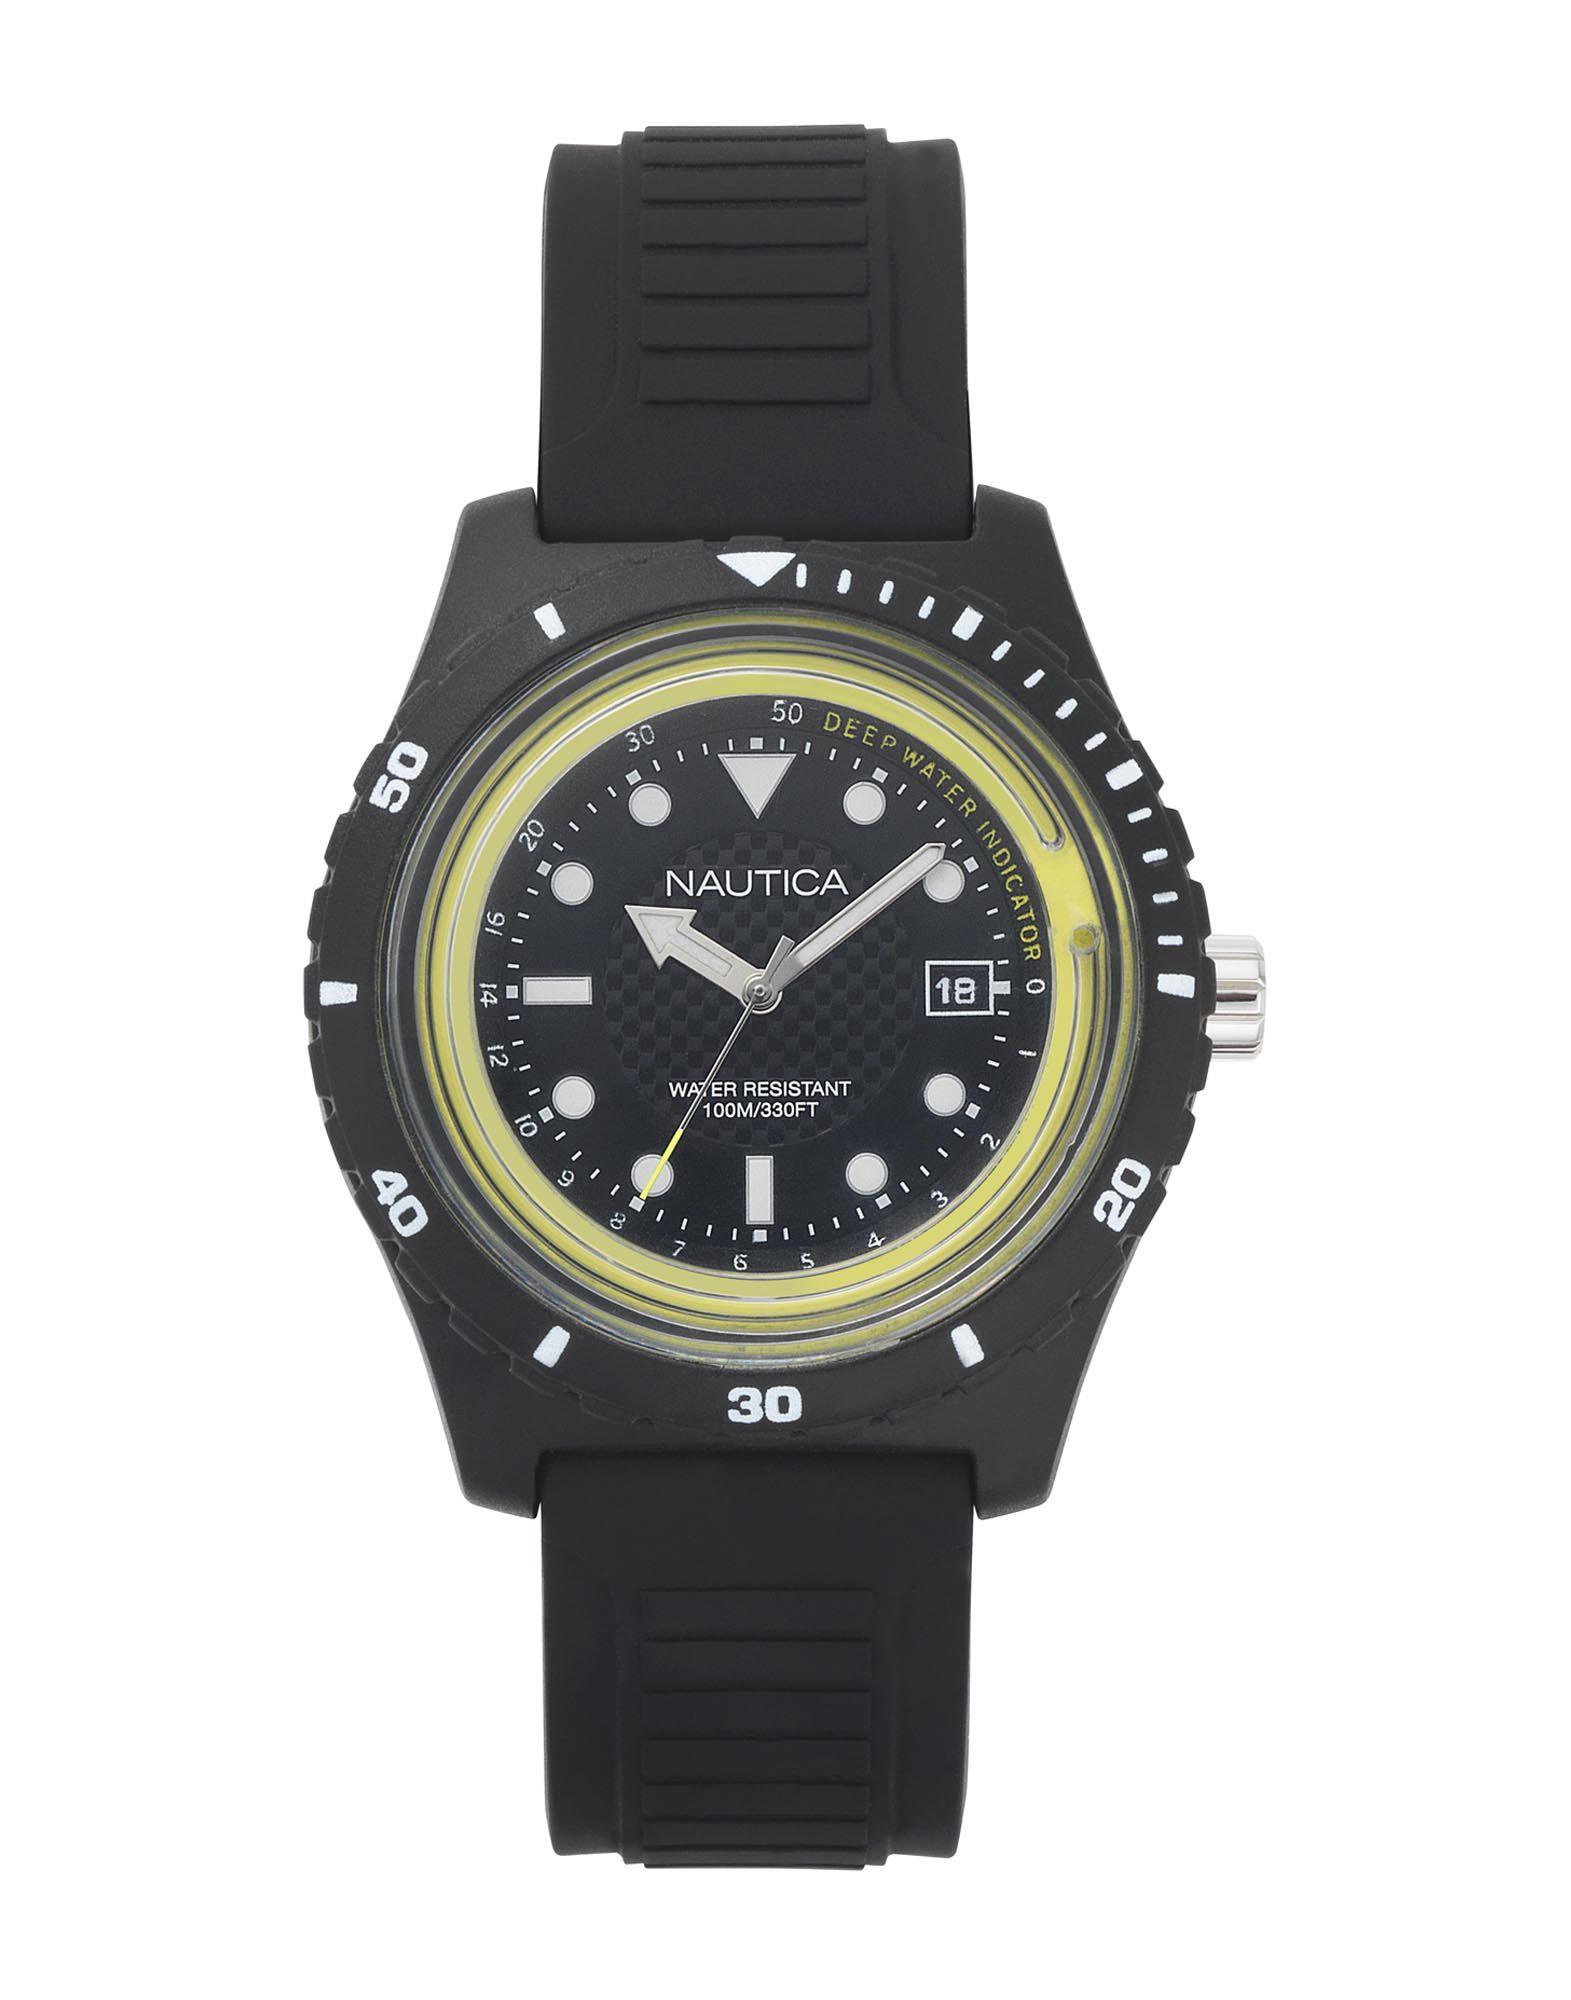 NAUTICA Наручные часы nautica napsdg003